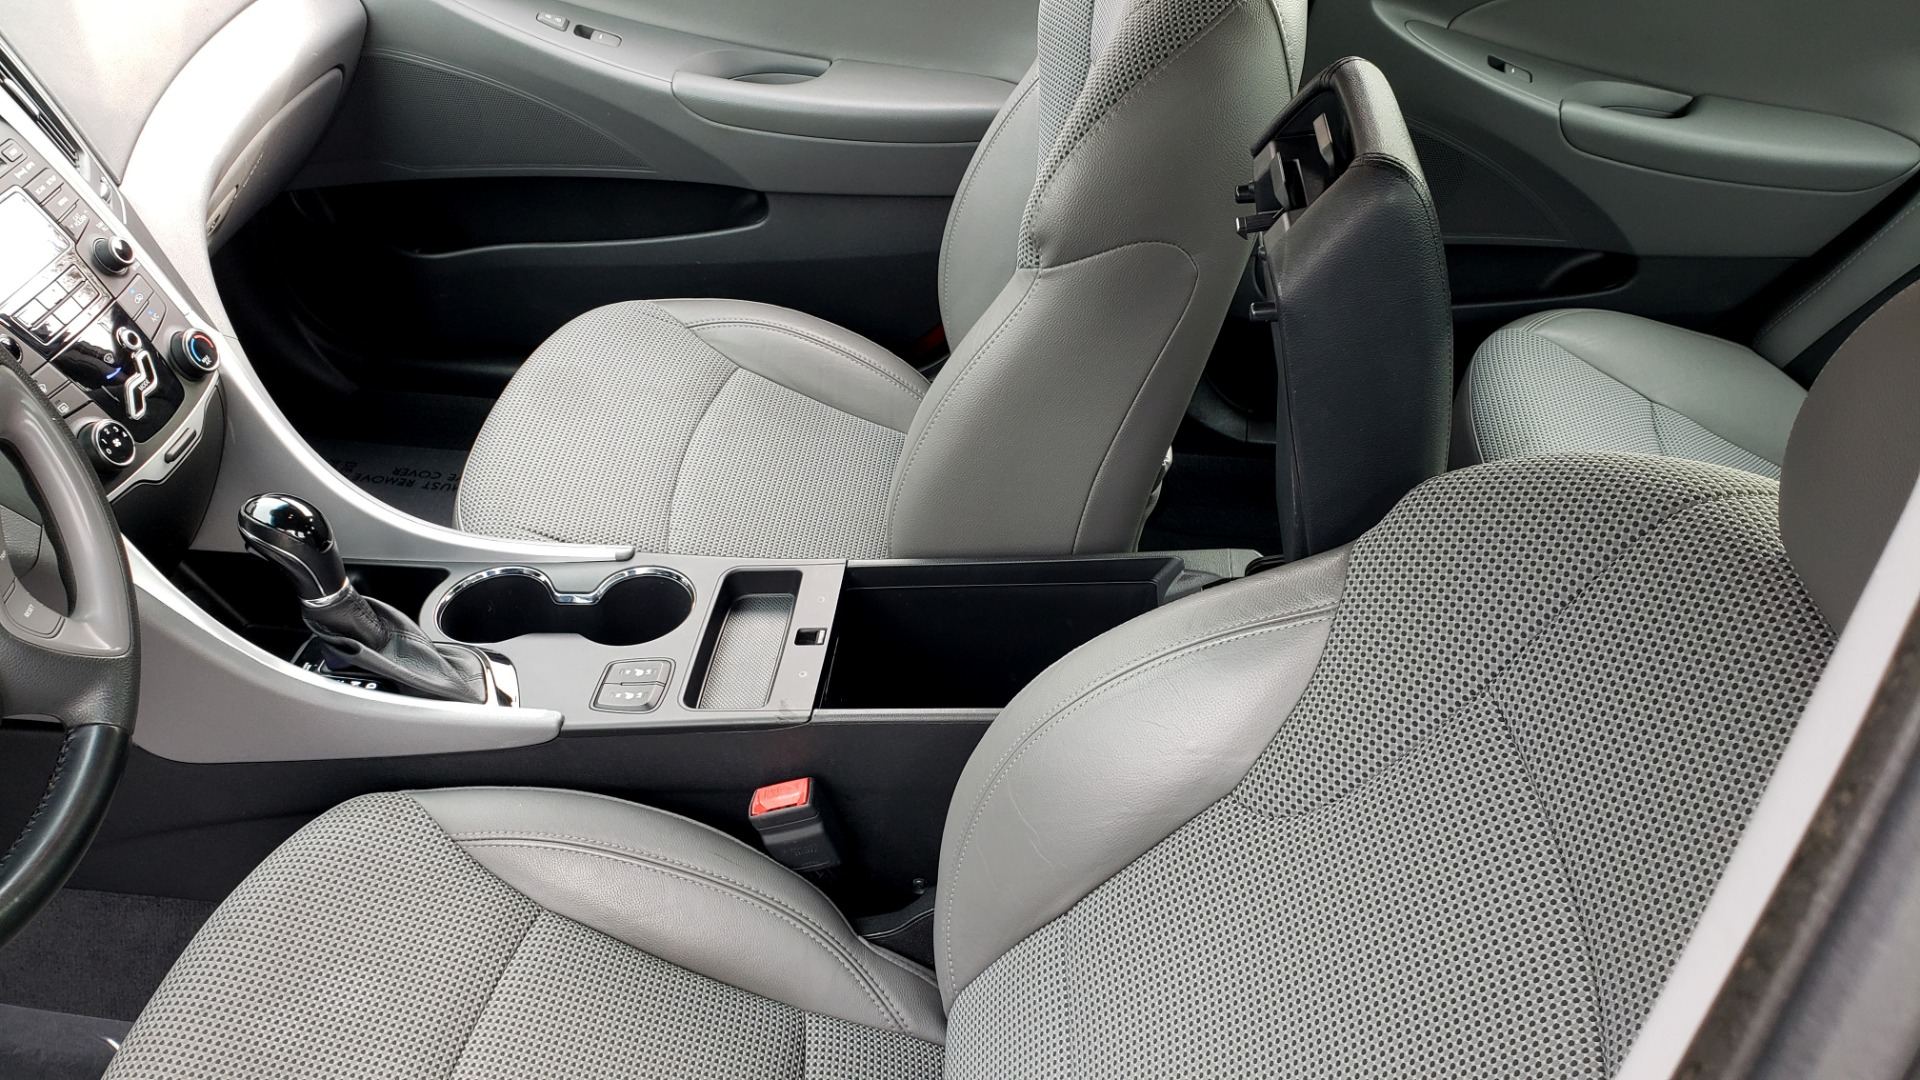 Used 2013 Hyundai SONATA SE AUTO / 2.4L 4-CYL / 6-SPD AUTO / VERY CLEAN for sale Sold at Formula Imports in Charlotte NC 28227 51